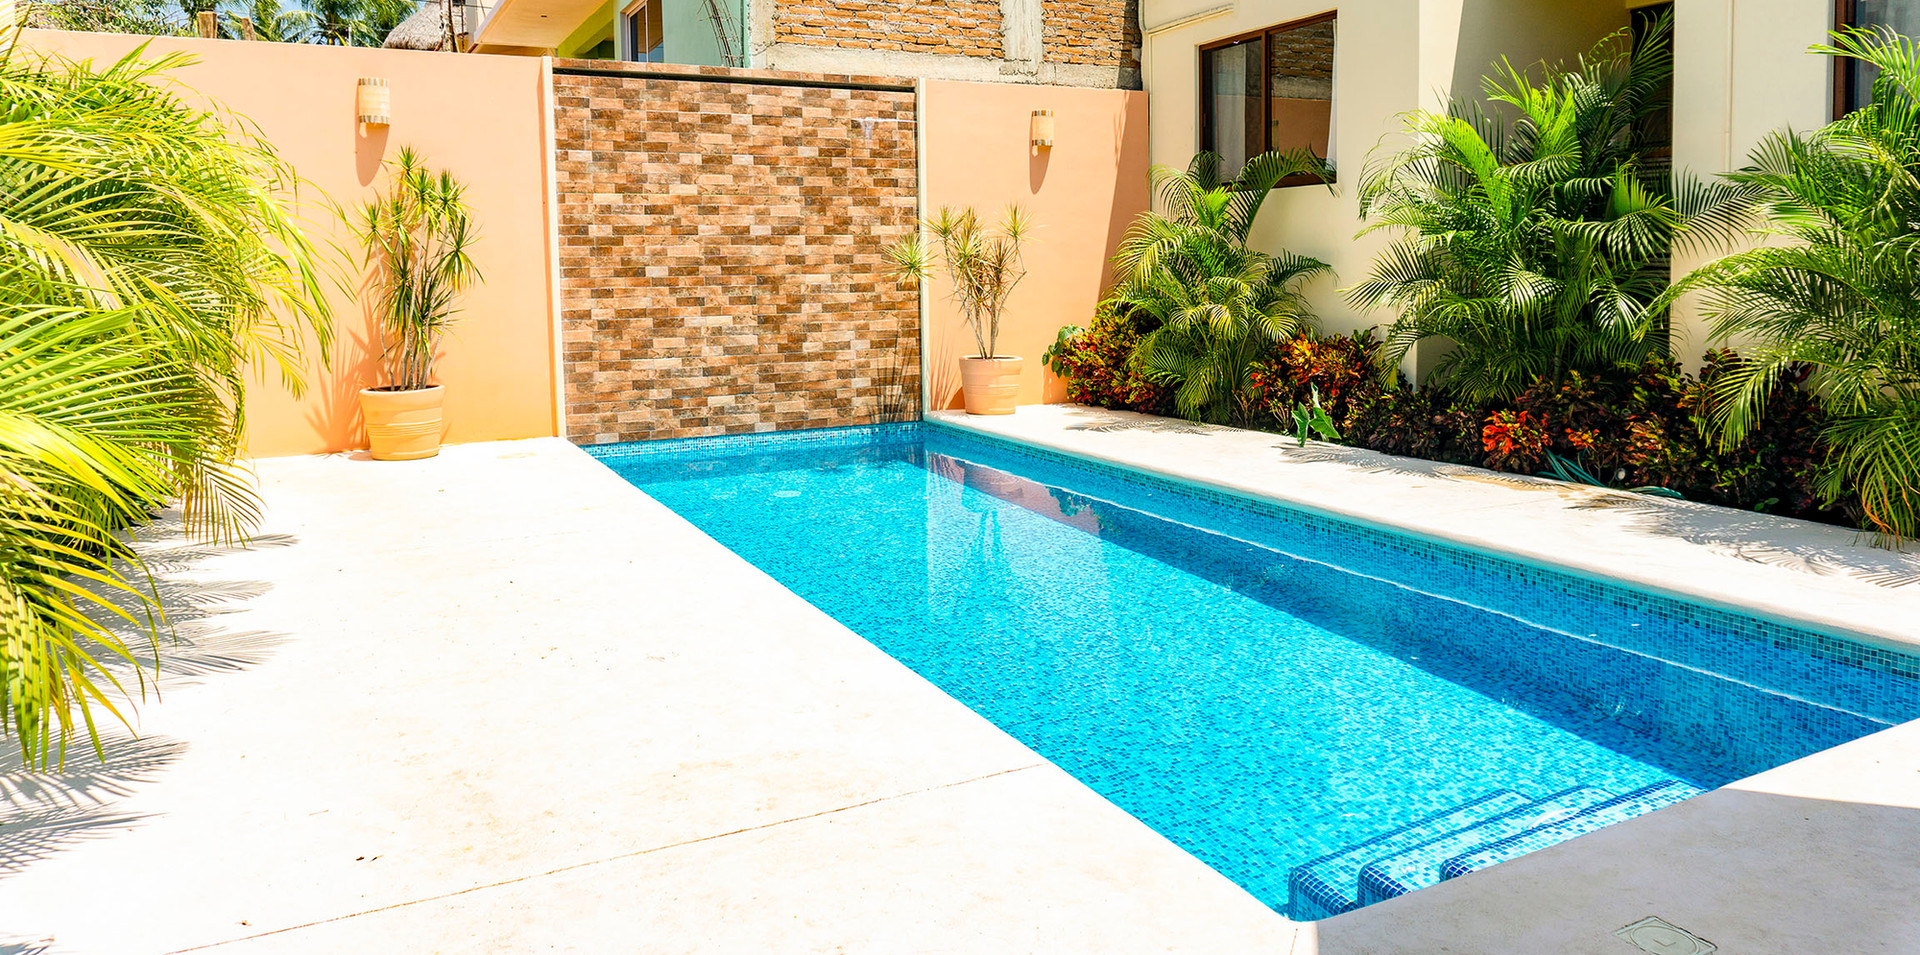 El Nopal Surf House - common area 5.jpg